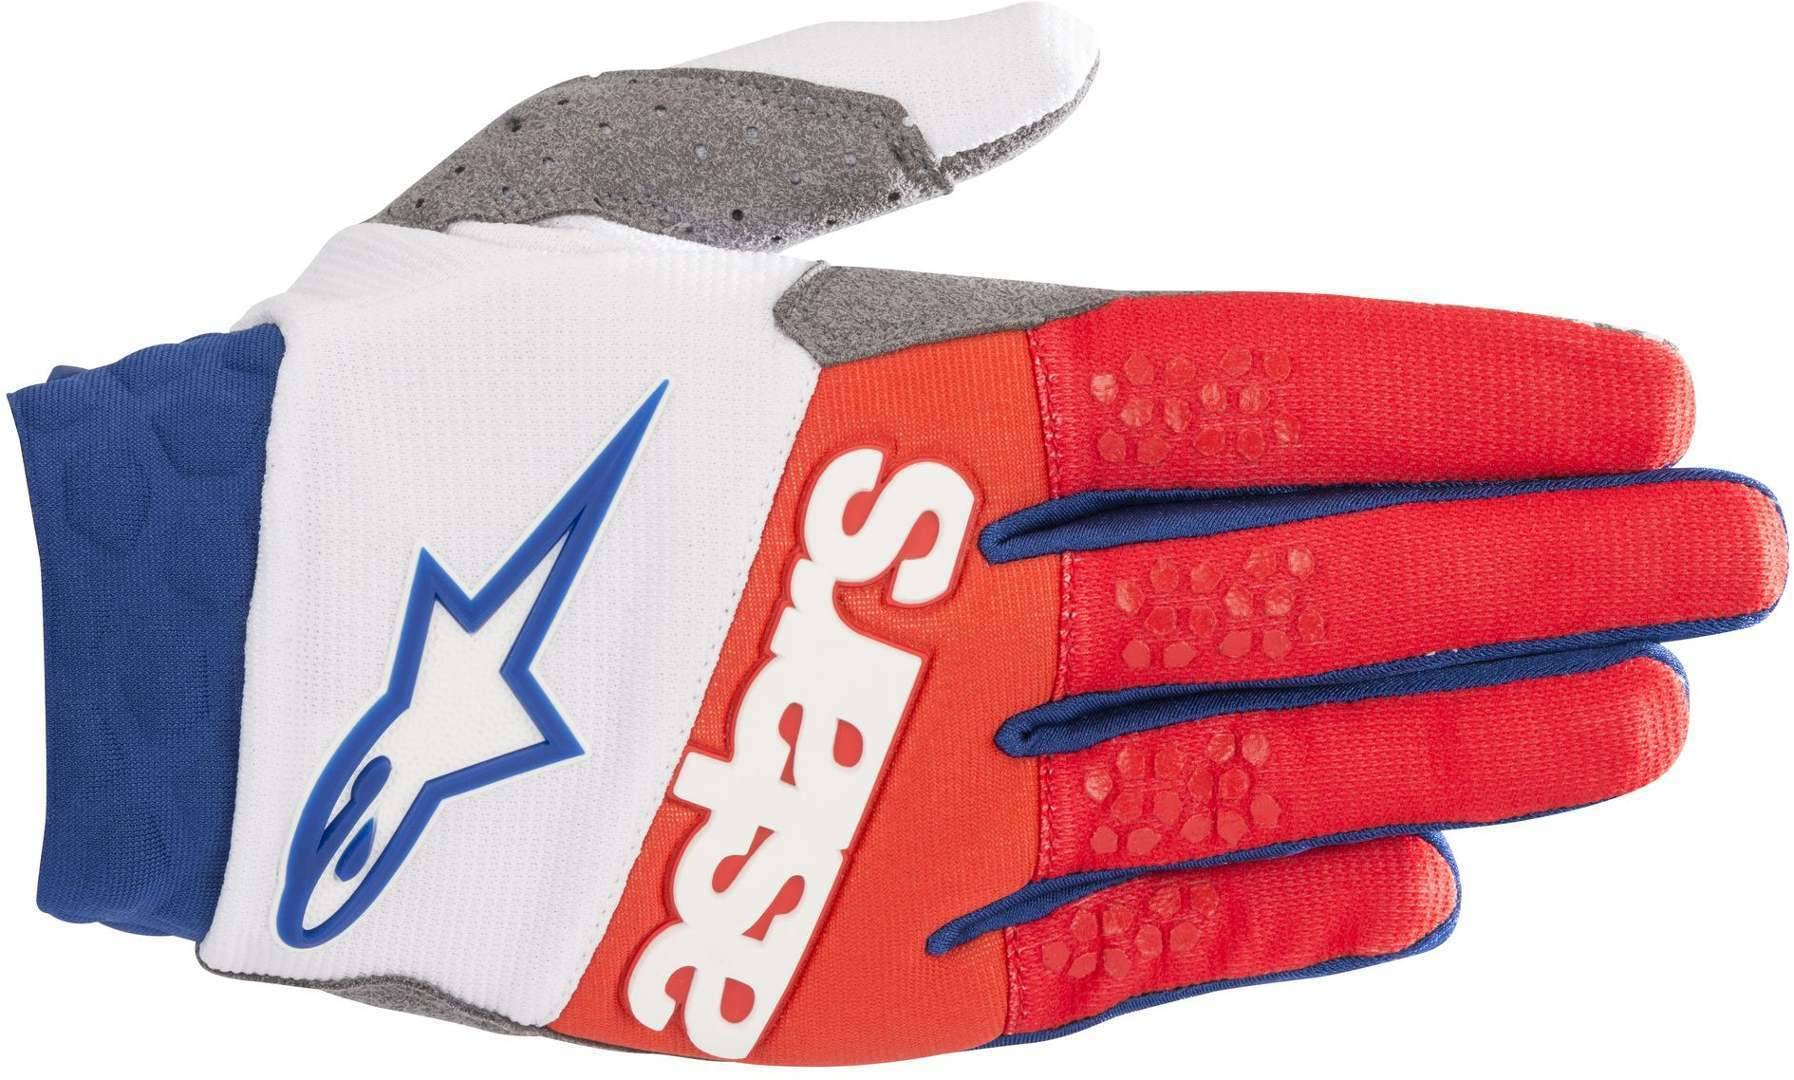 Alpinestars Racefend MX Textile Gloves White Red Blue 2XL